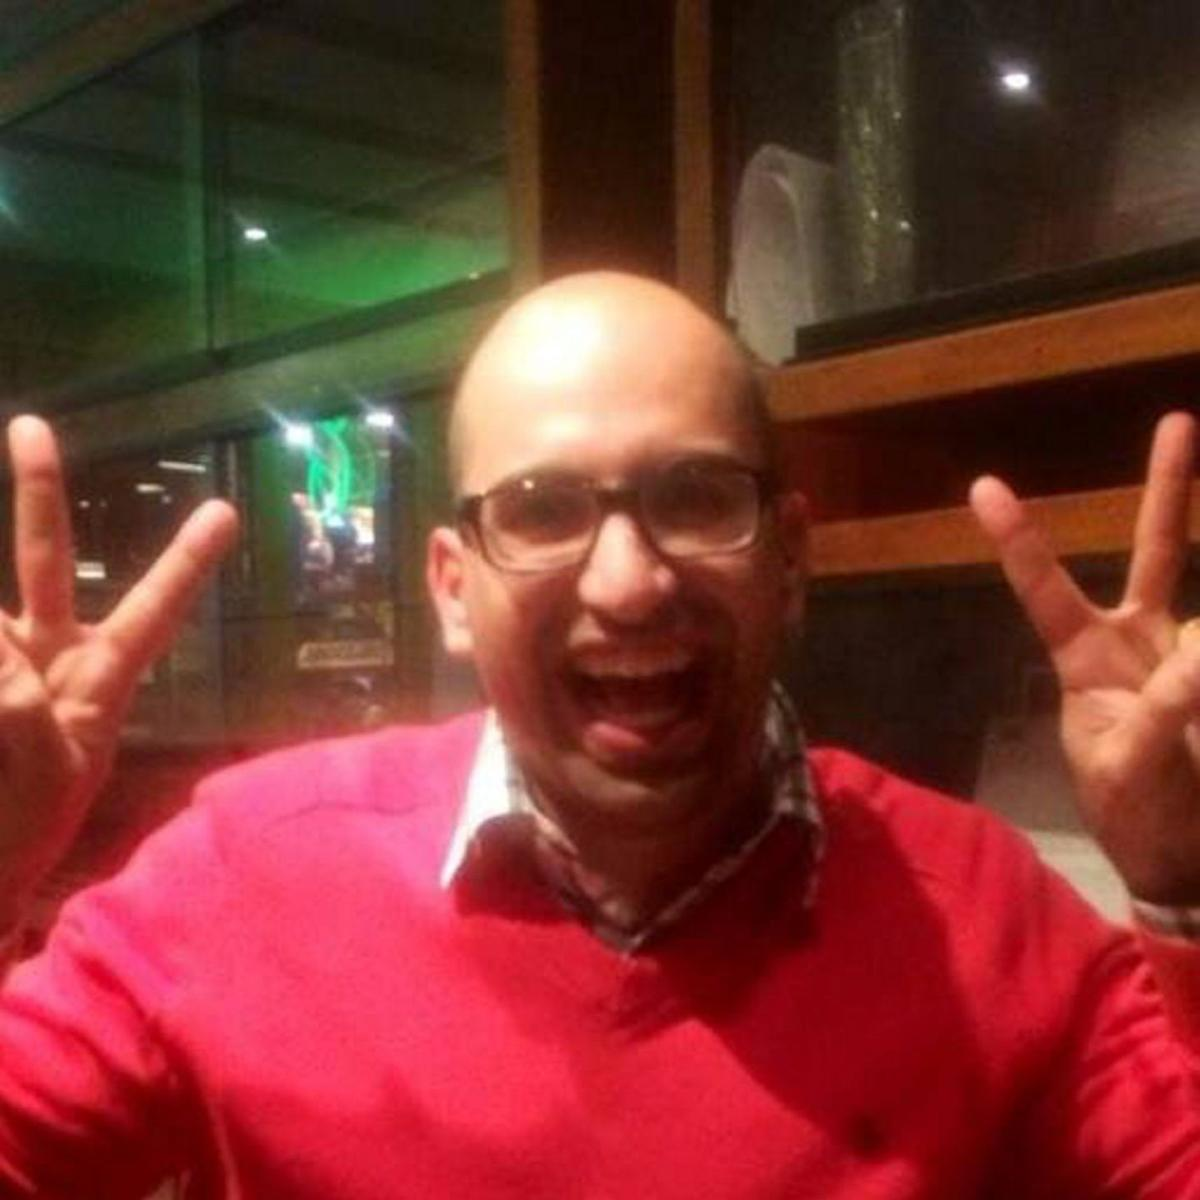 Salaita prompted donors' fury